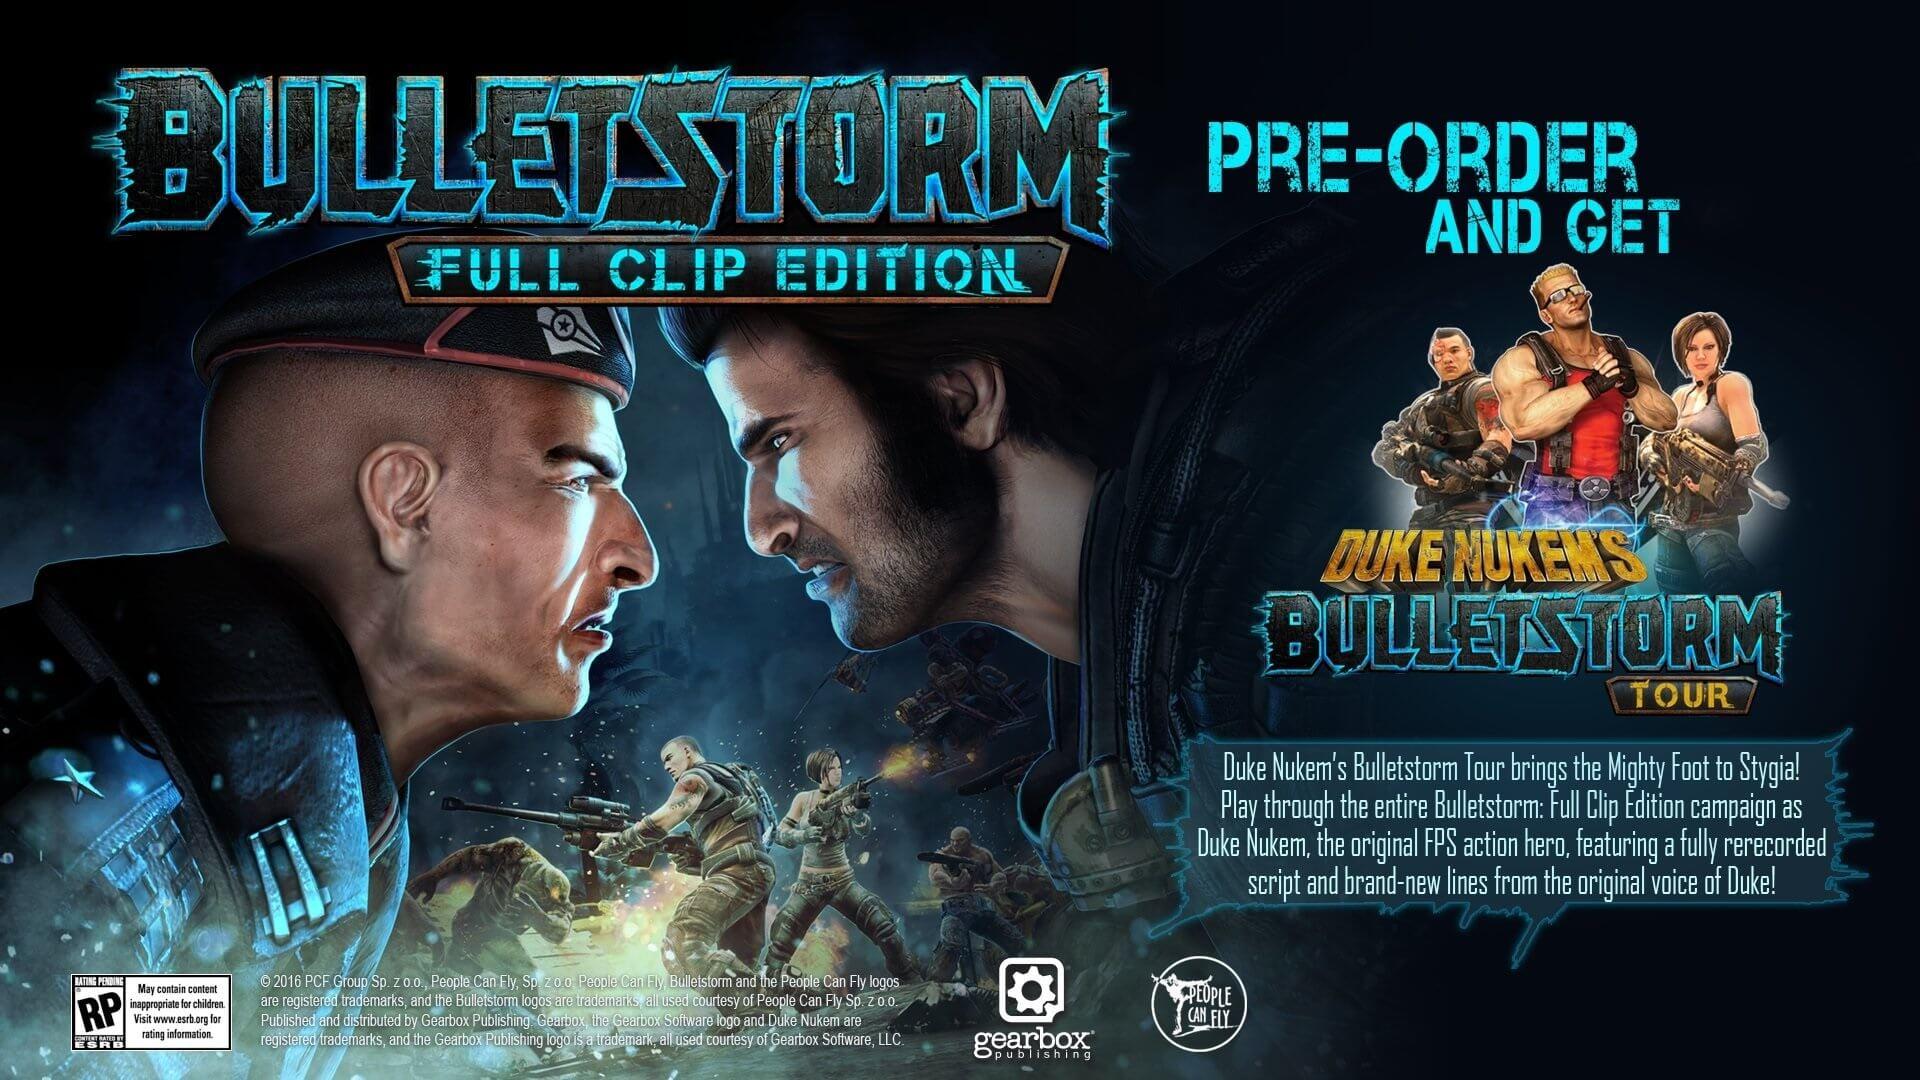 Картинки по запросу Bulletstorm Full Clip Edition wallpaper